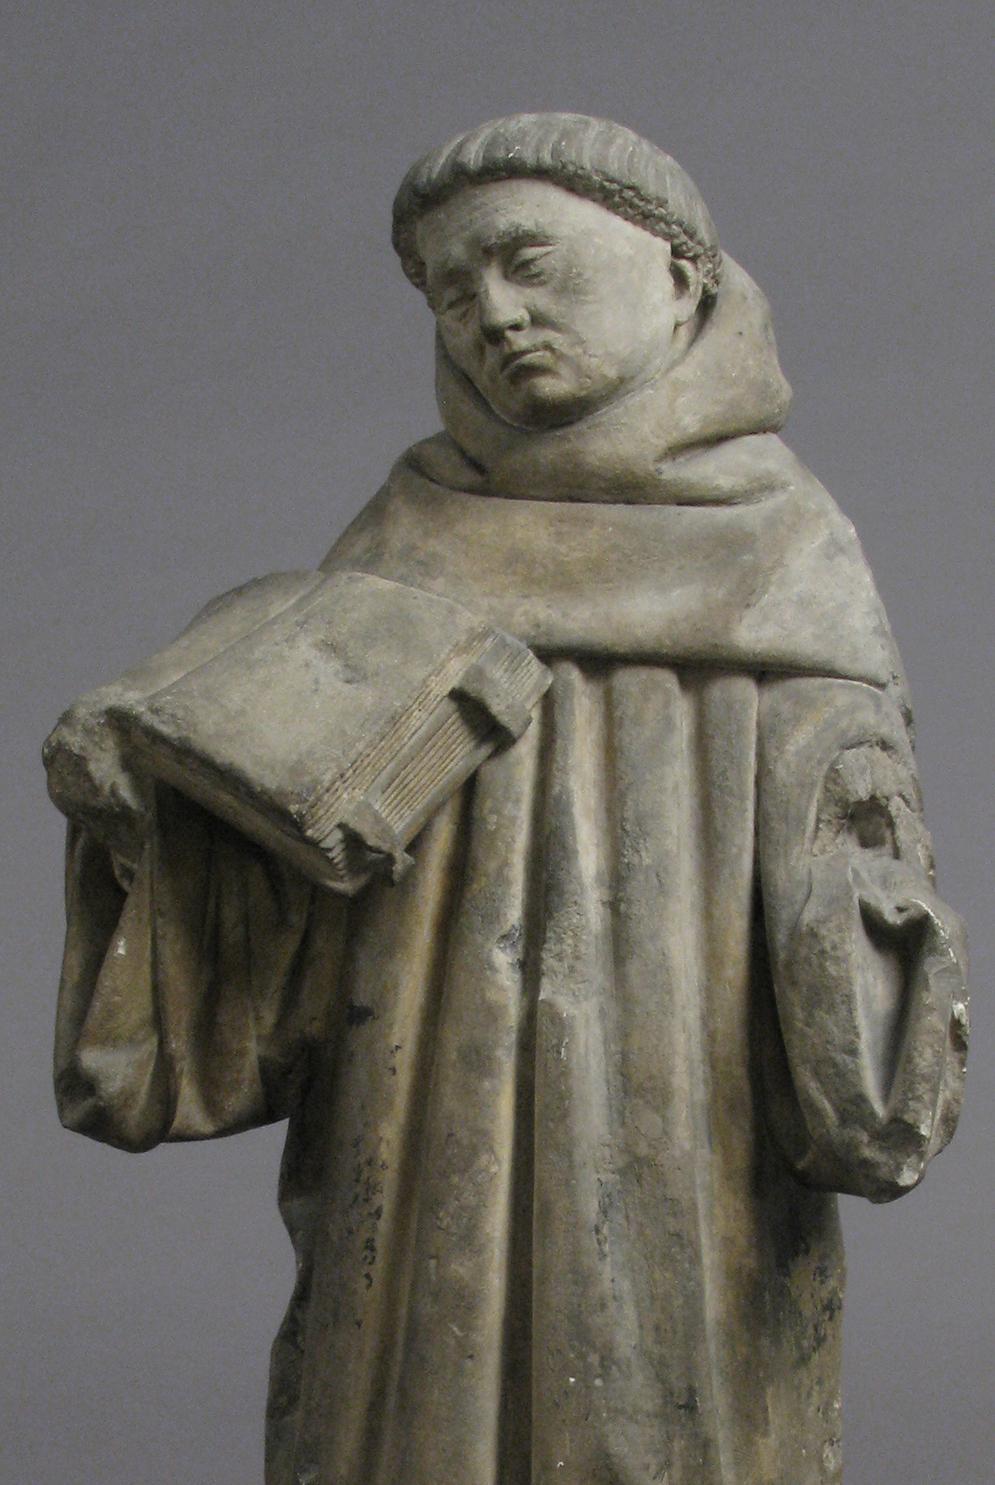 Monk, c. 1400. The Metropolitan Museum of Art, Gift of J. Pierpont Morgan, 1917.